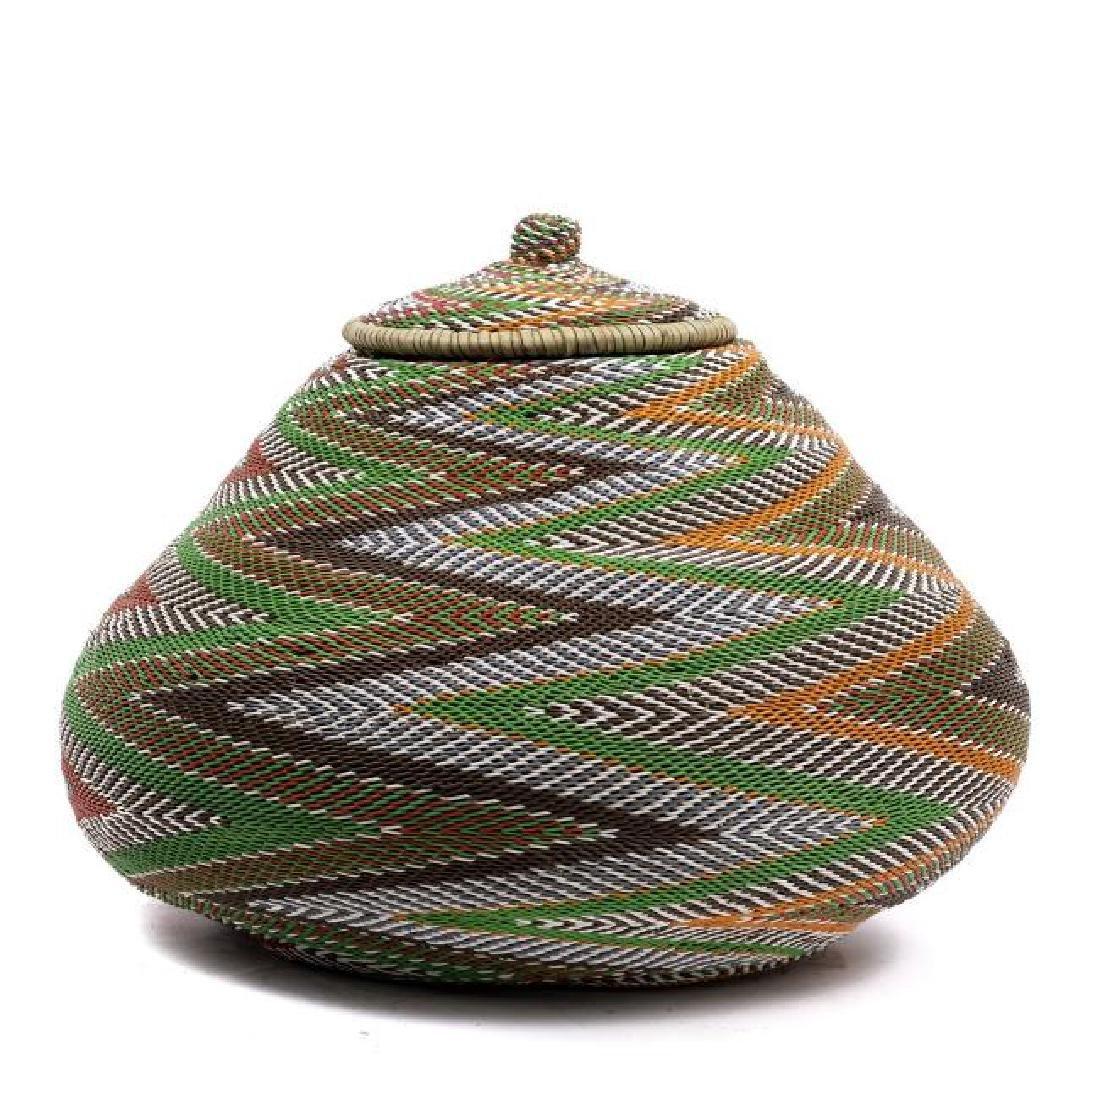 Zulu Telephone Wire Basket, South Africa